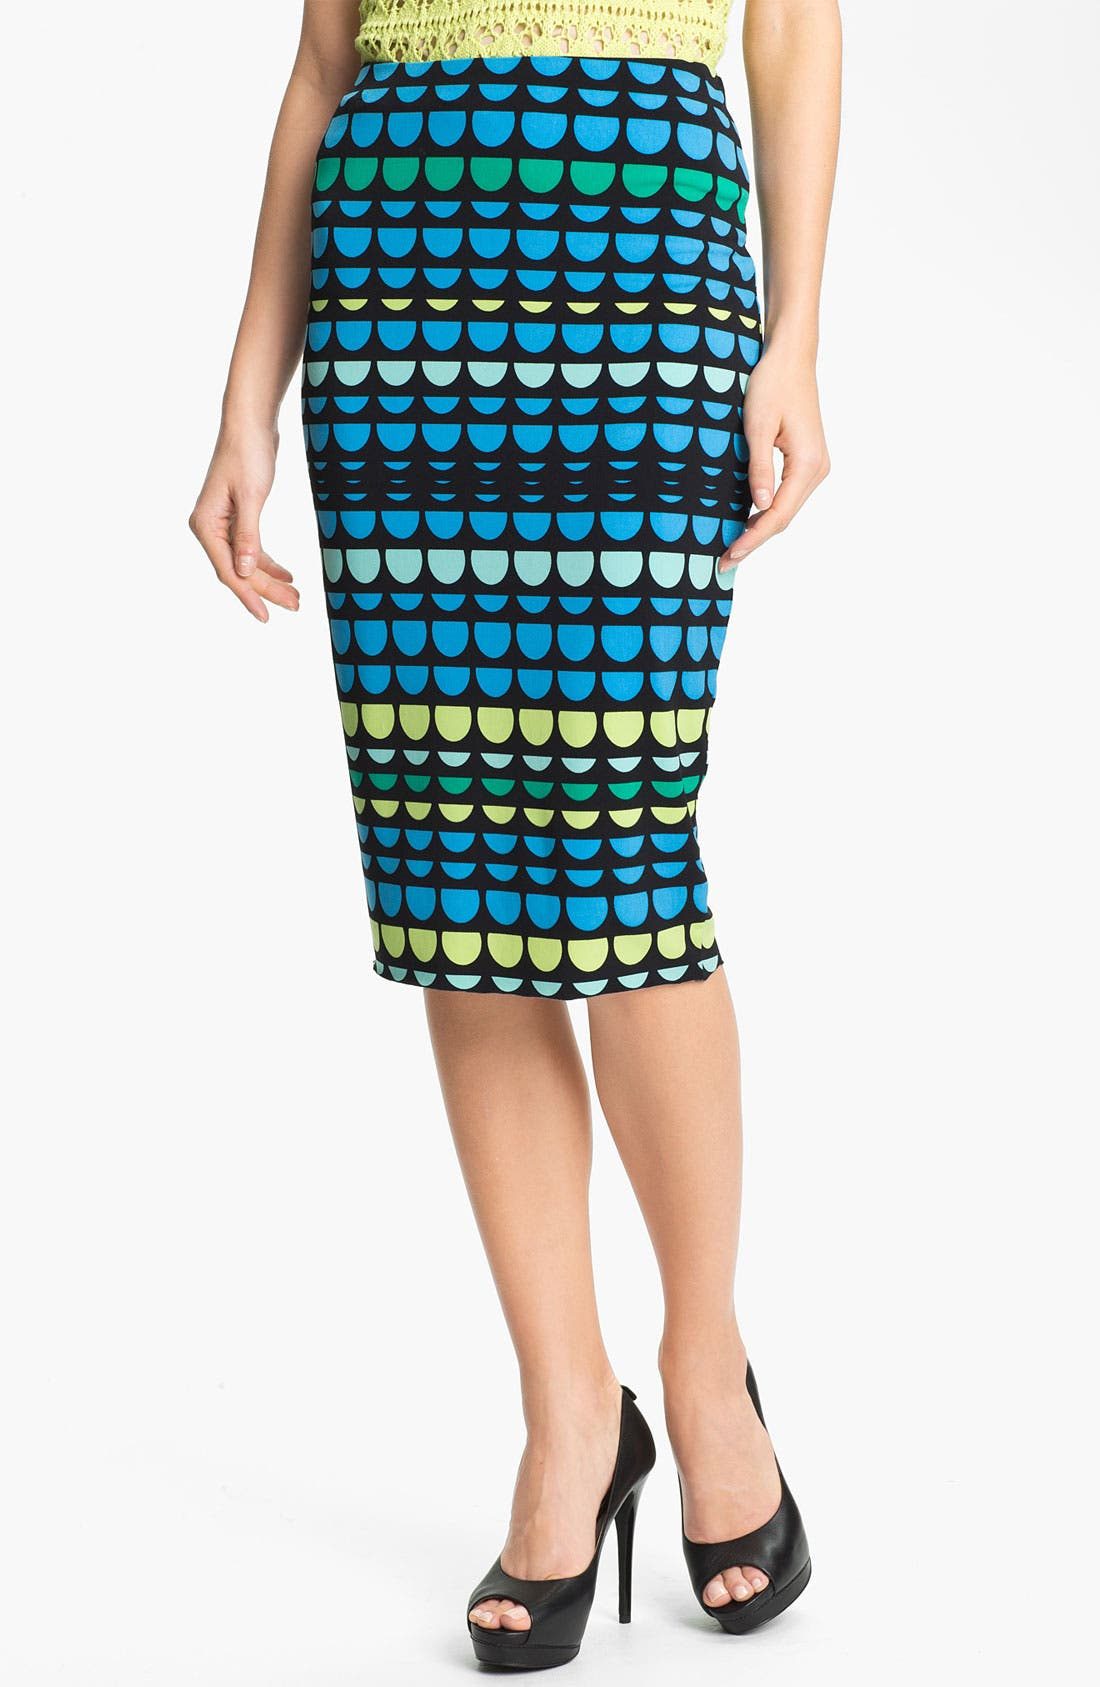 Alternate Image 1 Selected - Vince Camuto Midi Tube Skirt